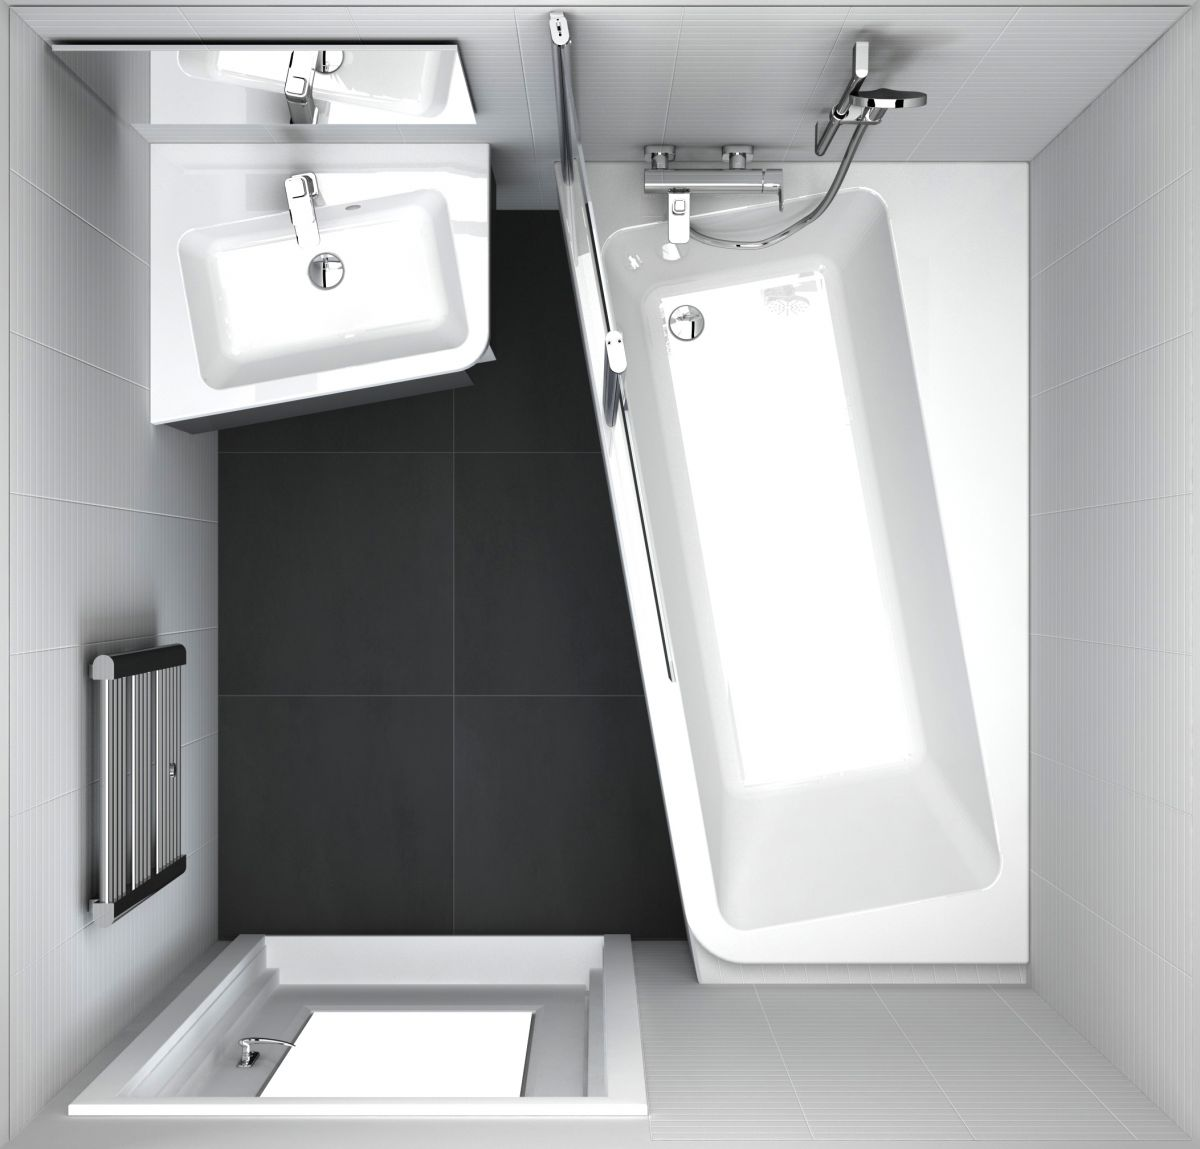 Ванна акриловая Ravak В 10° 160х95 белая